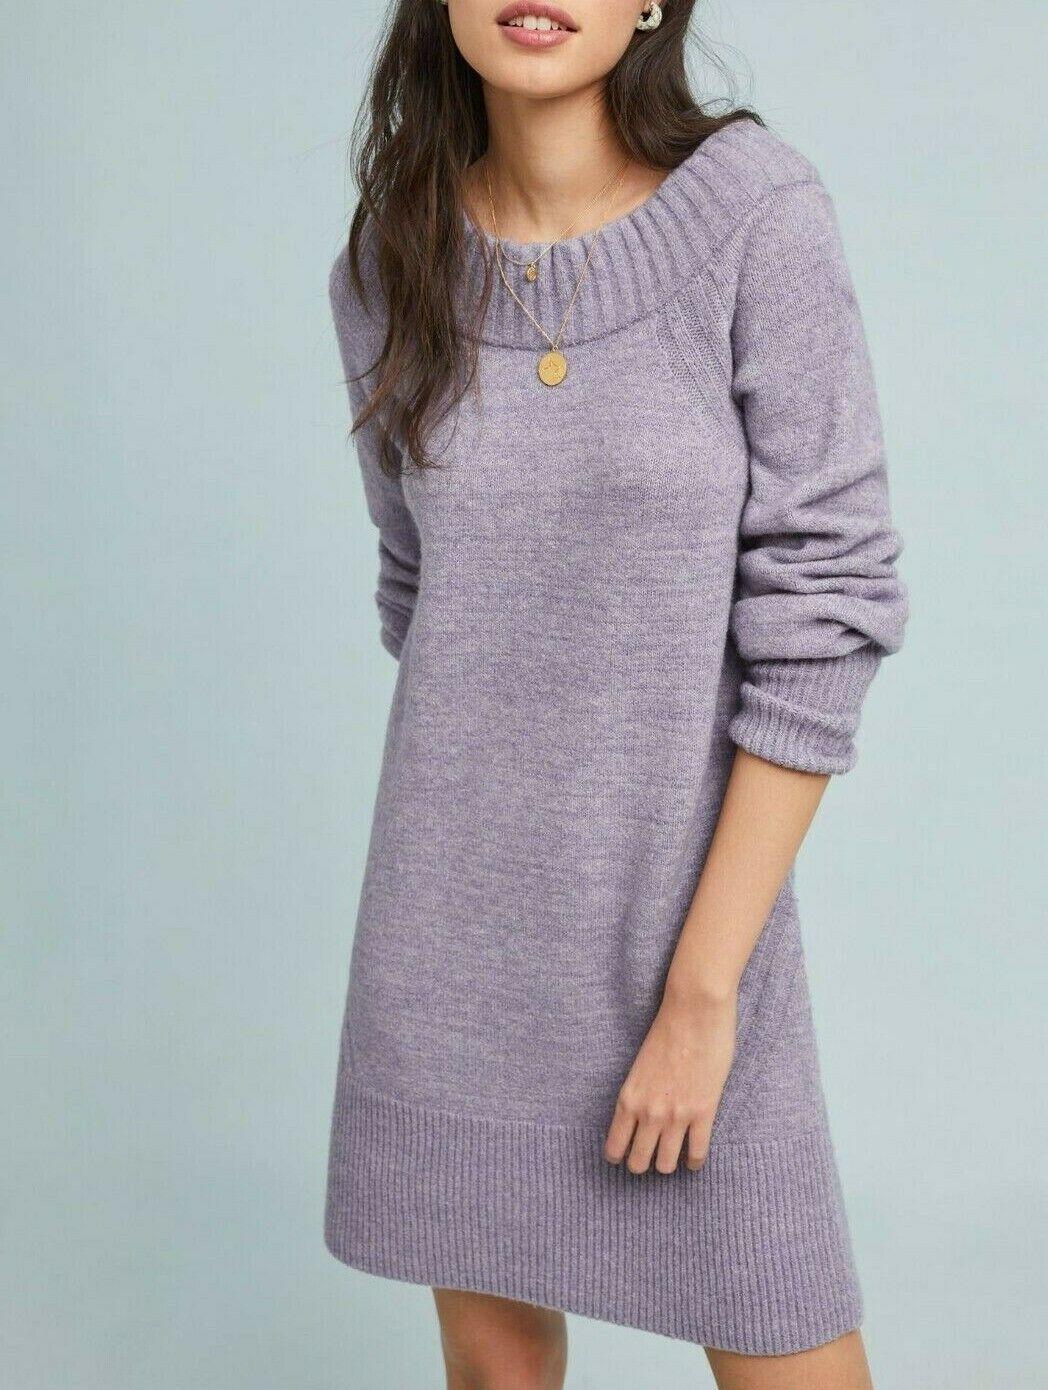 Anthropologie Rhyme Sweater Dress  Sz S - NWT